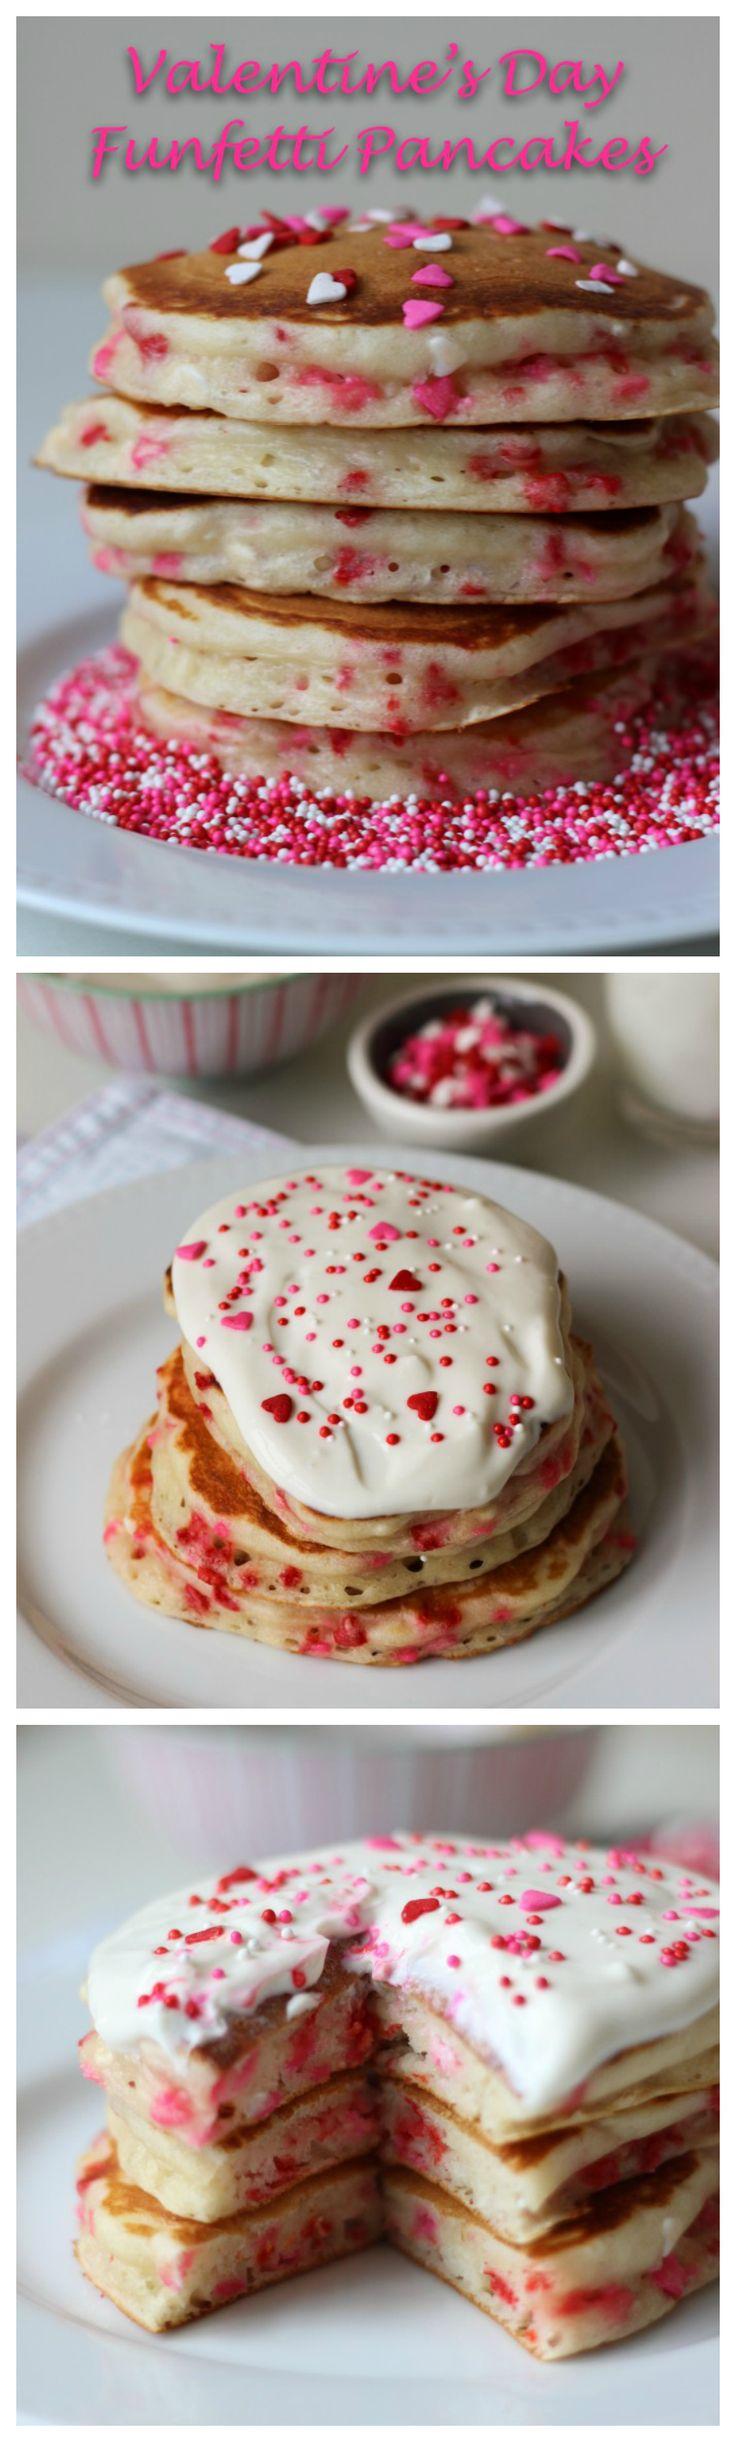 Valentine's Day Funfetti Pancakes with Vanilla Greek Yogurt Sauce | ChezCateyLou.com